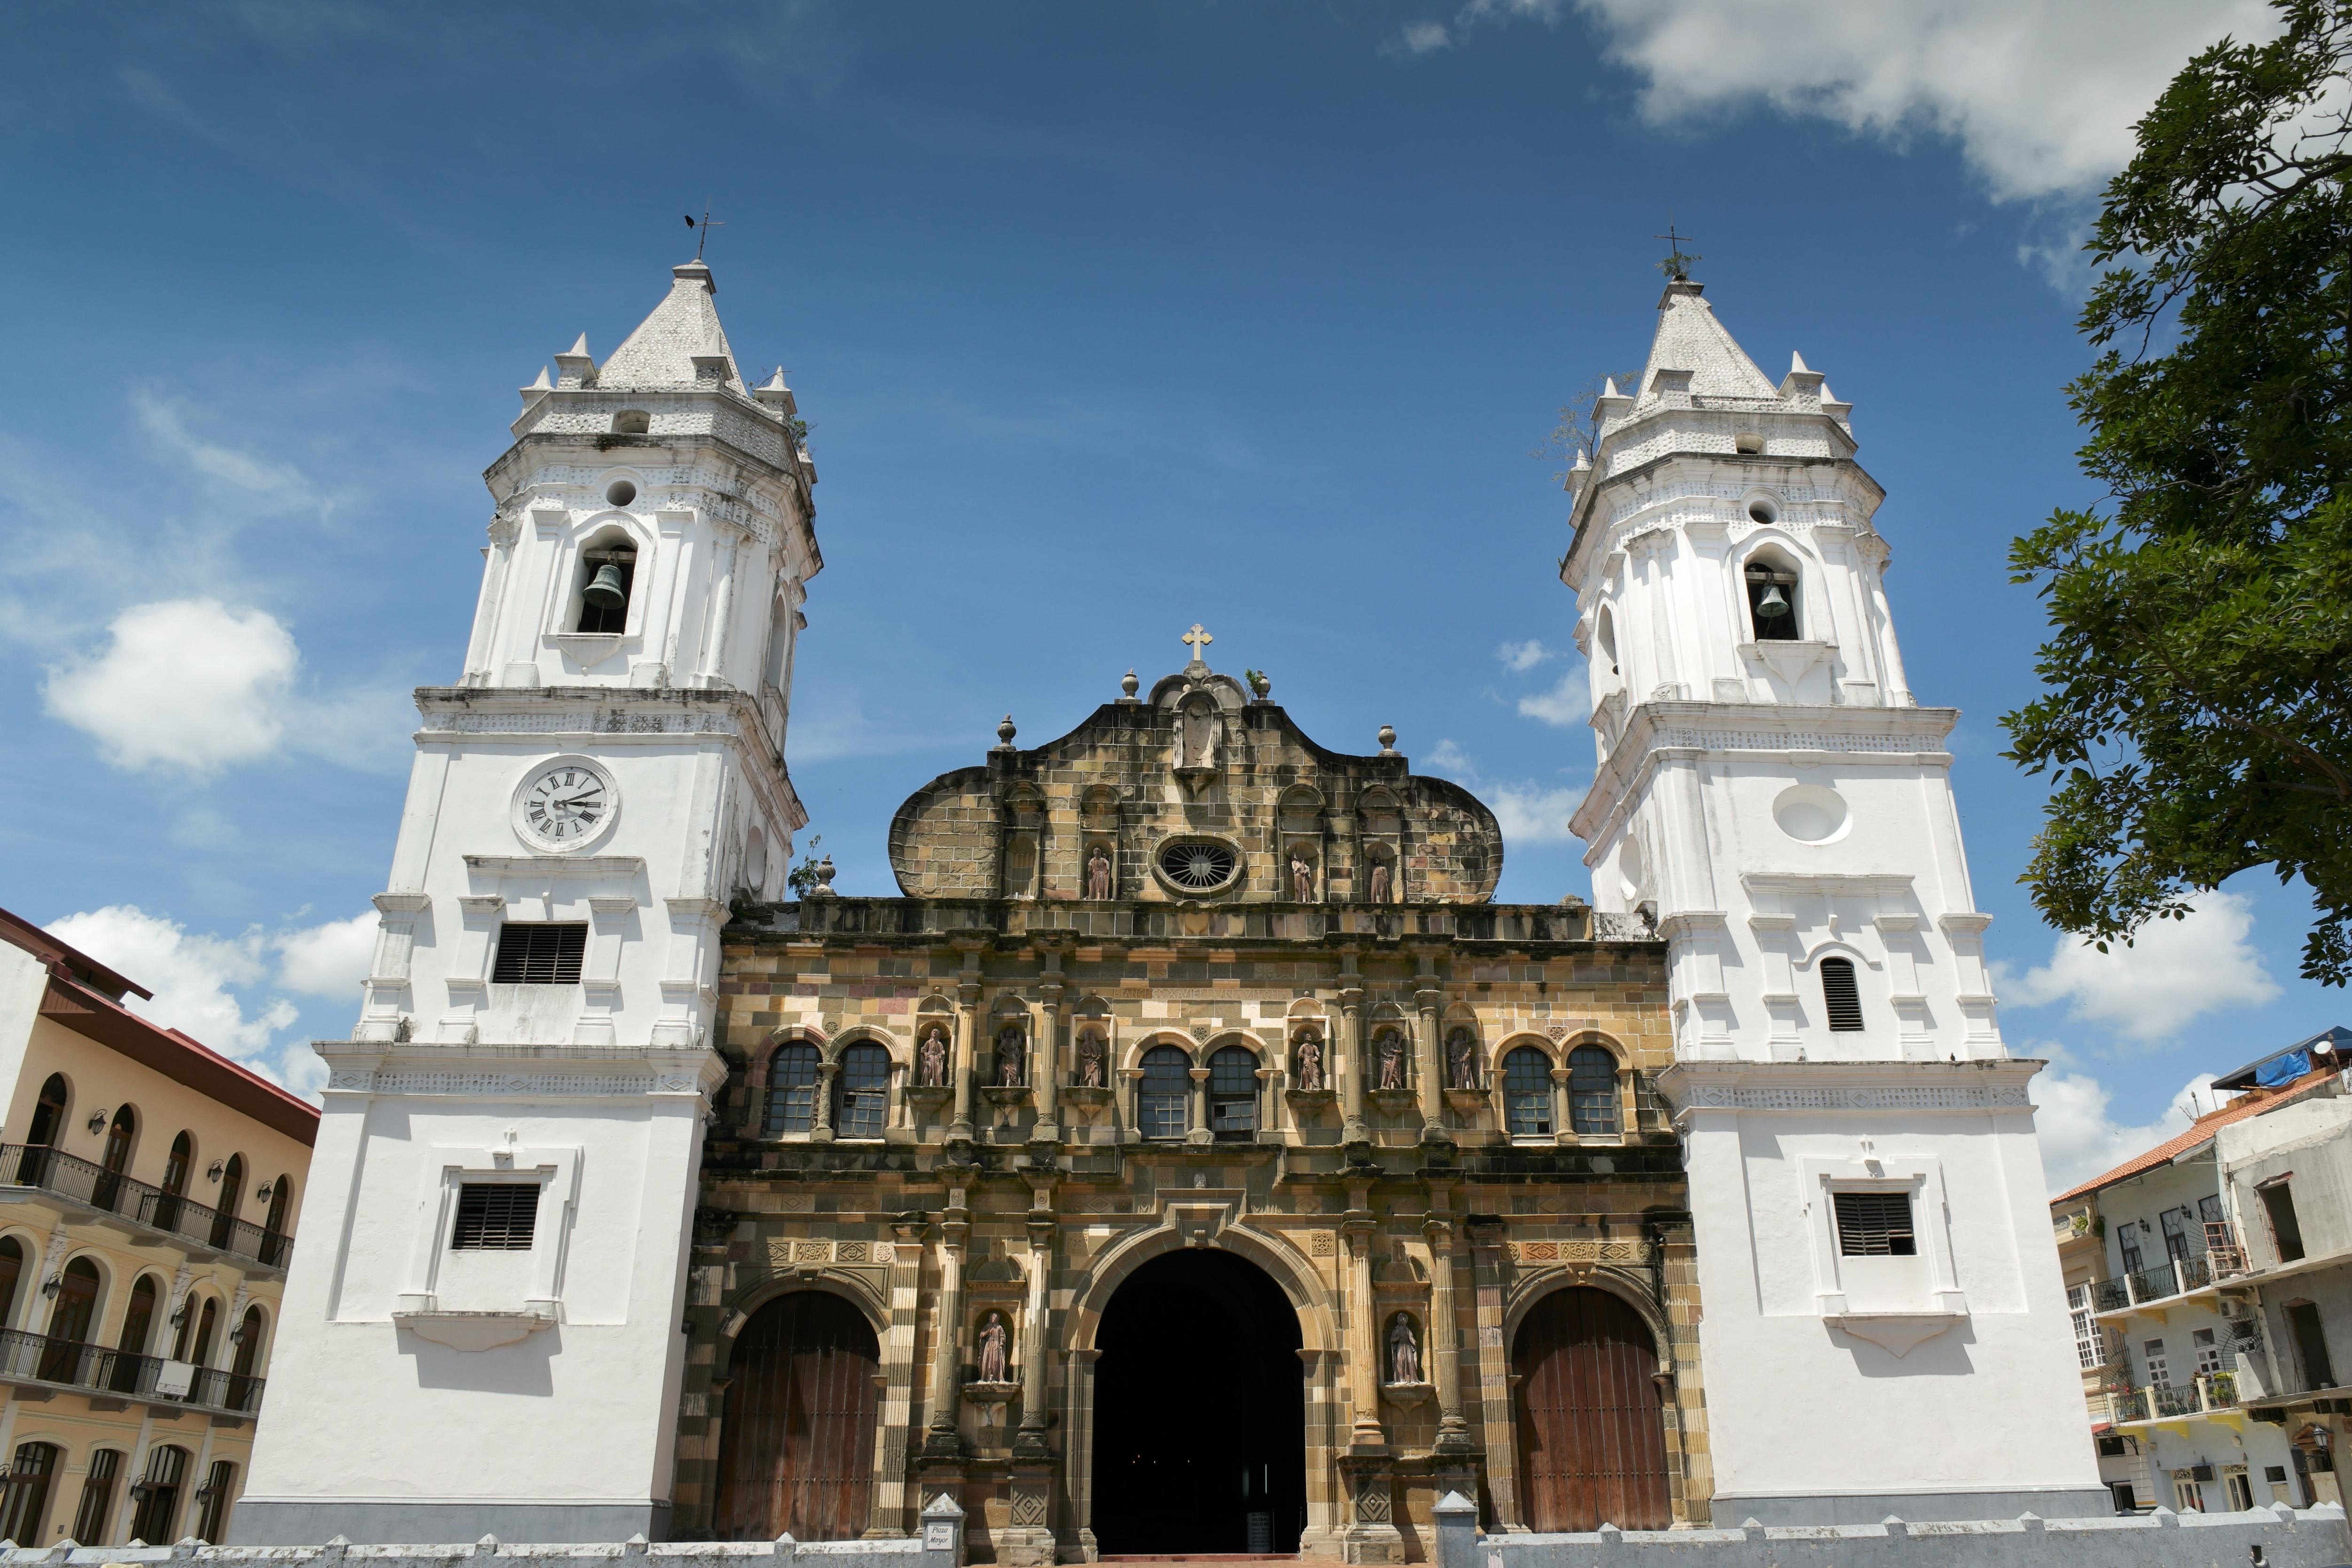 Casco Viejo老城區